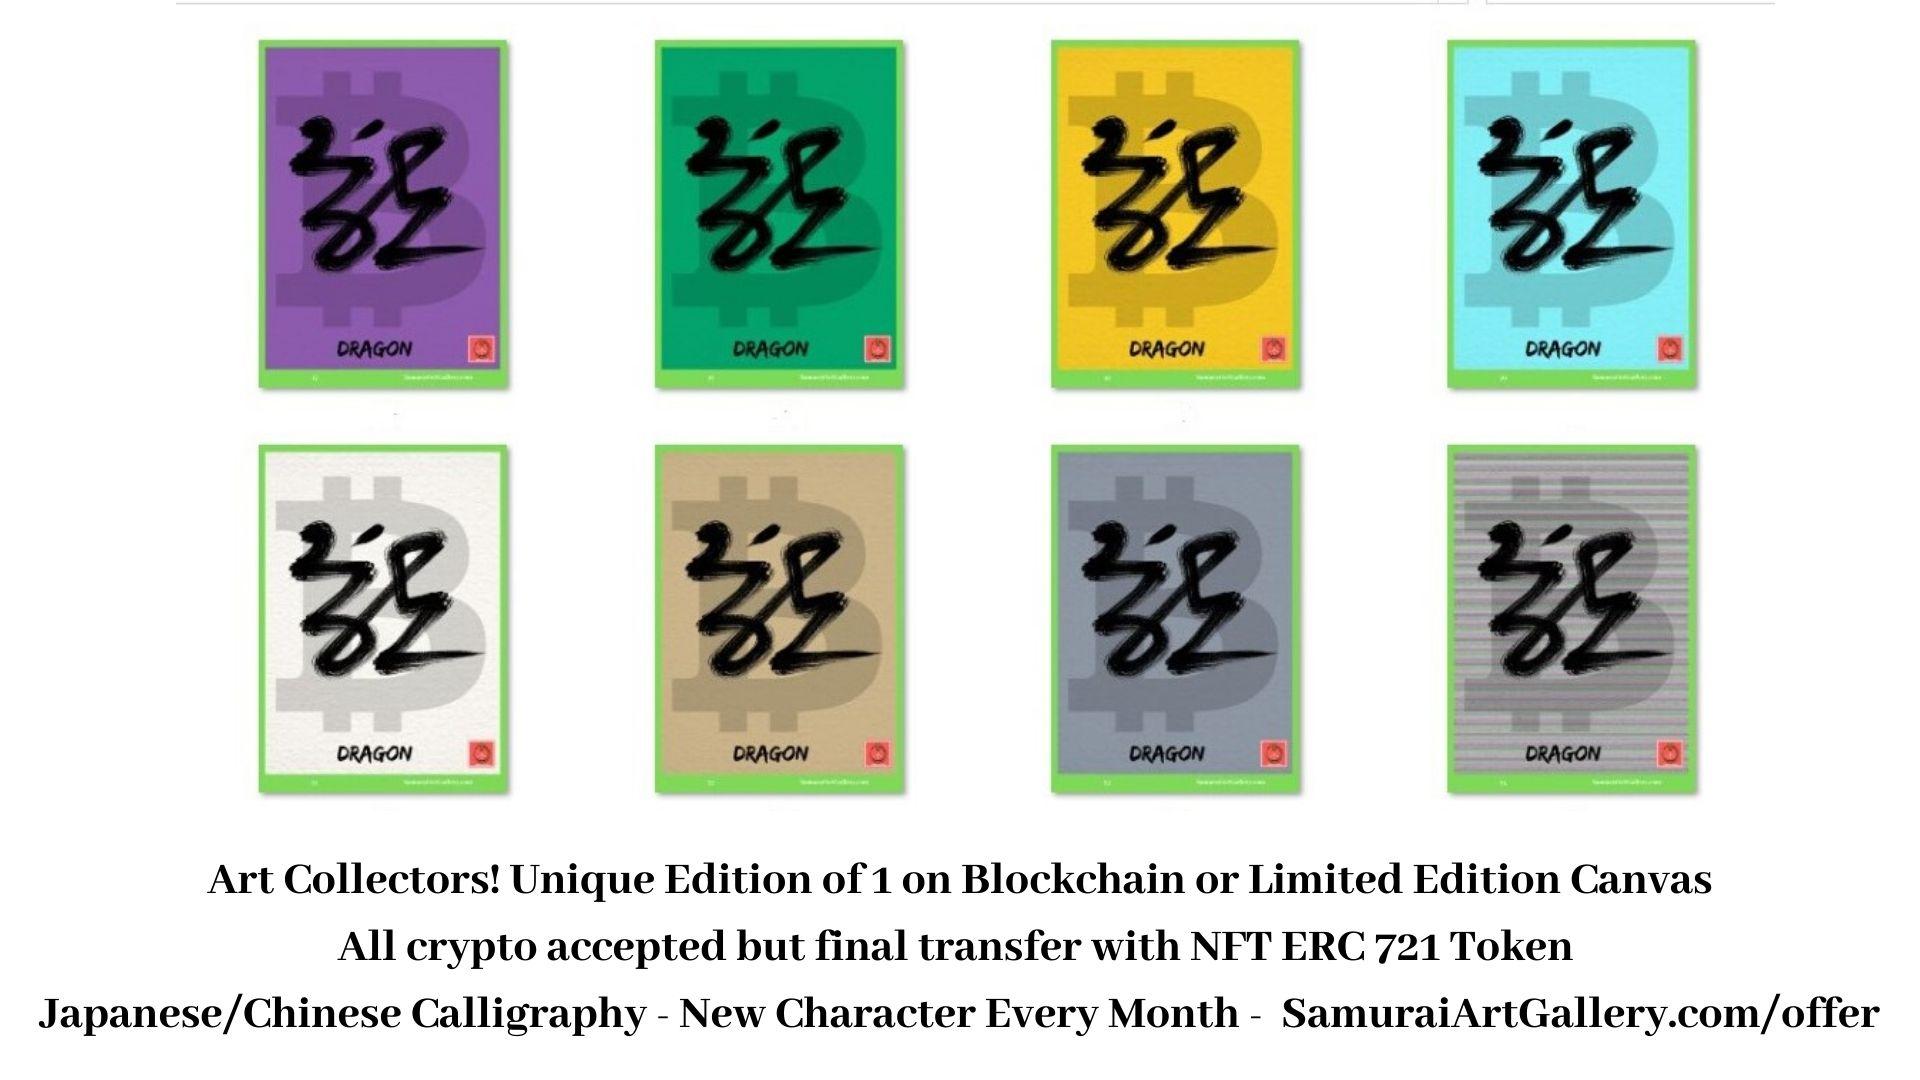 JapaneseChinese Dragon Calligraphy  Bitcoin  NFT  ERC 721  Mike Cecotka  SamuraiArtGallerycom